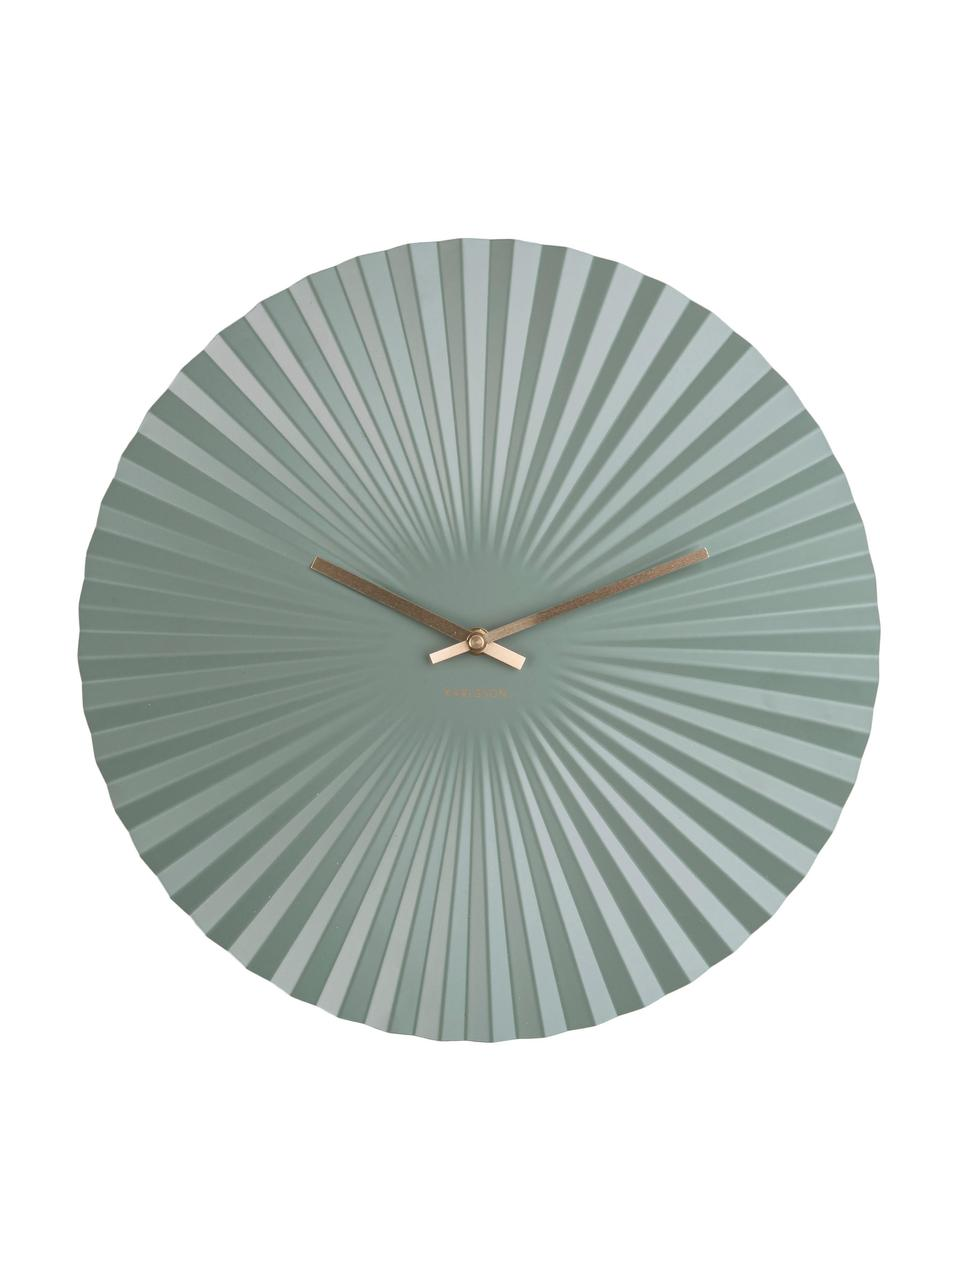 Wandklok Sensu, Gecoat metaal, Mintgroen, messingkleurig, Ø 40 cm